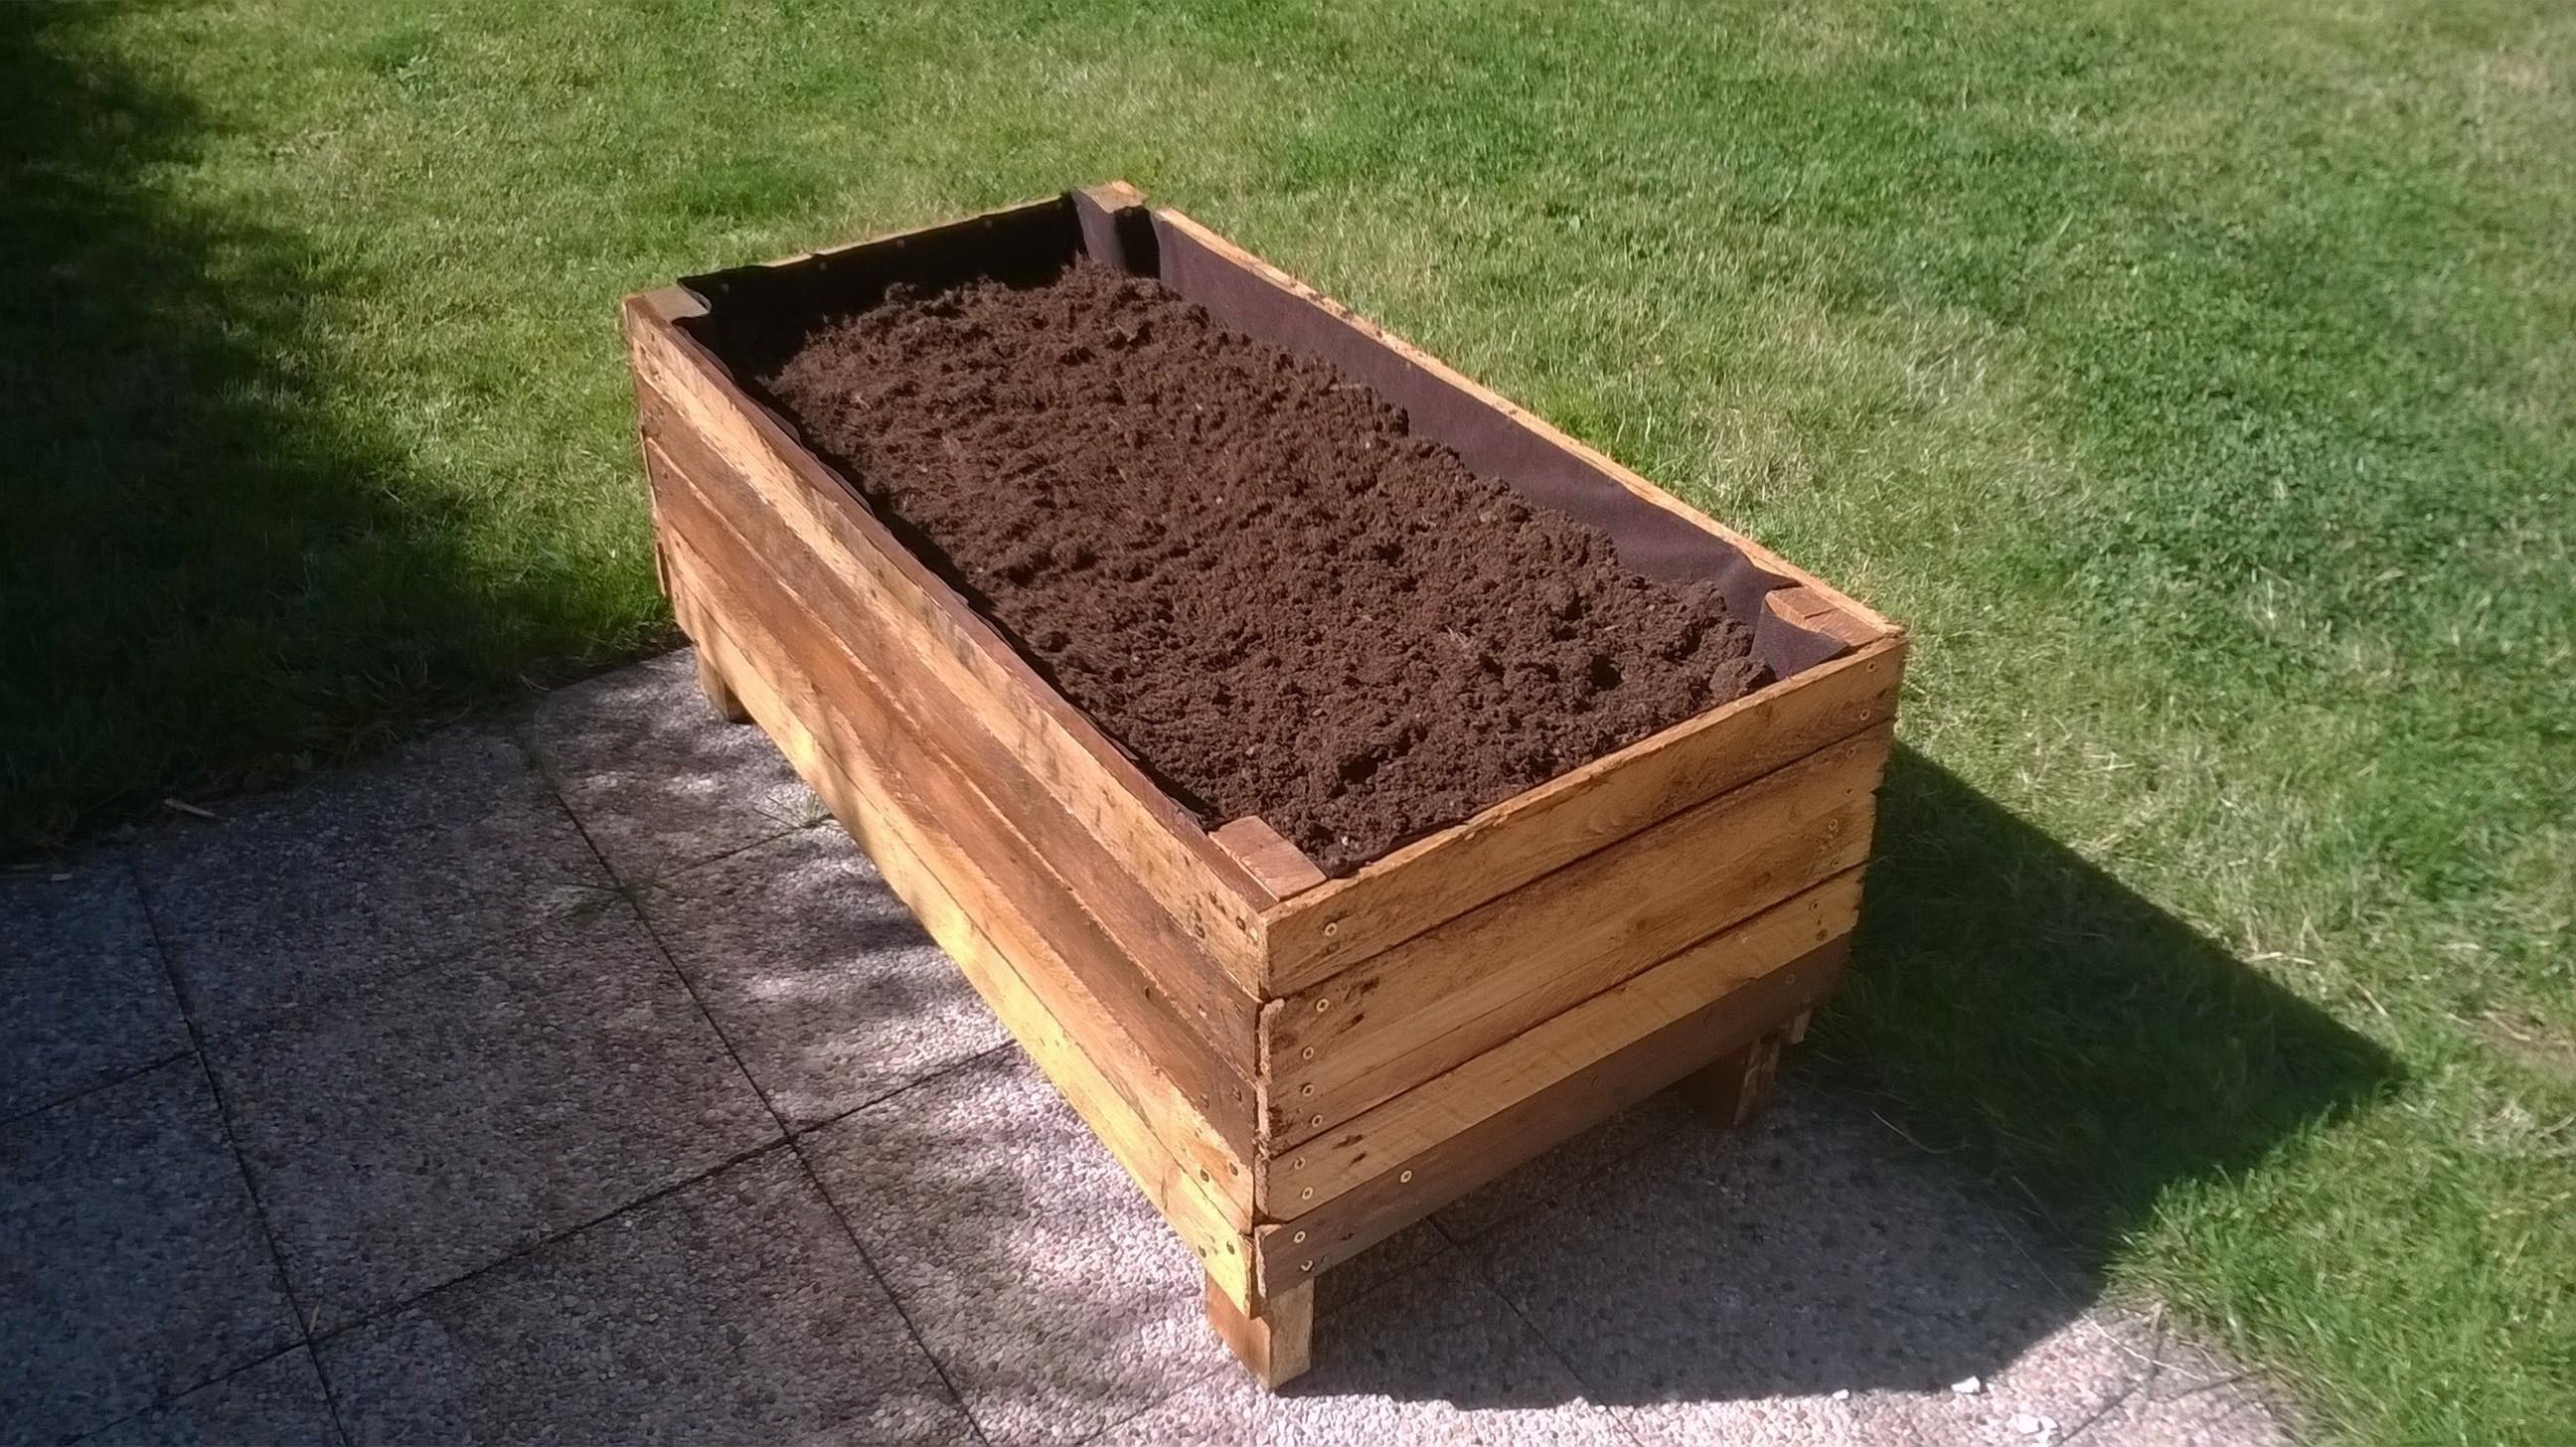 Pallet Planter · How To Make A Pallet Planter · Home + DIY